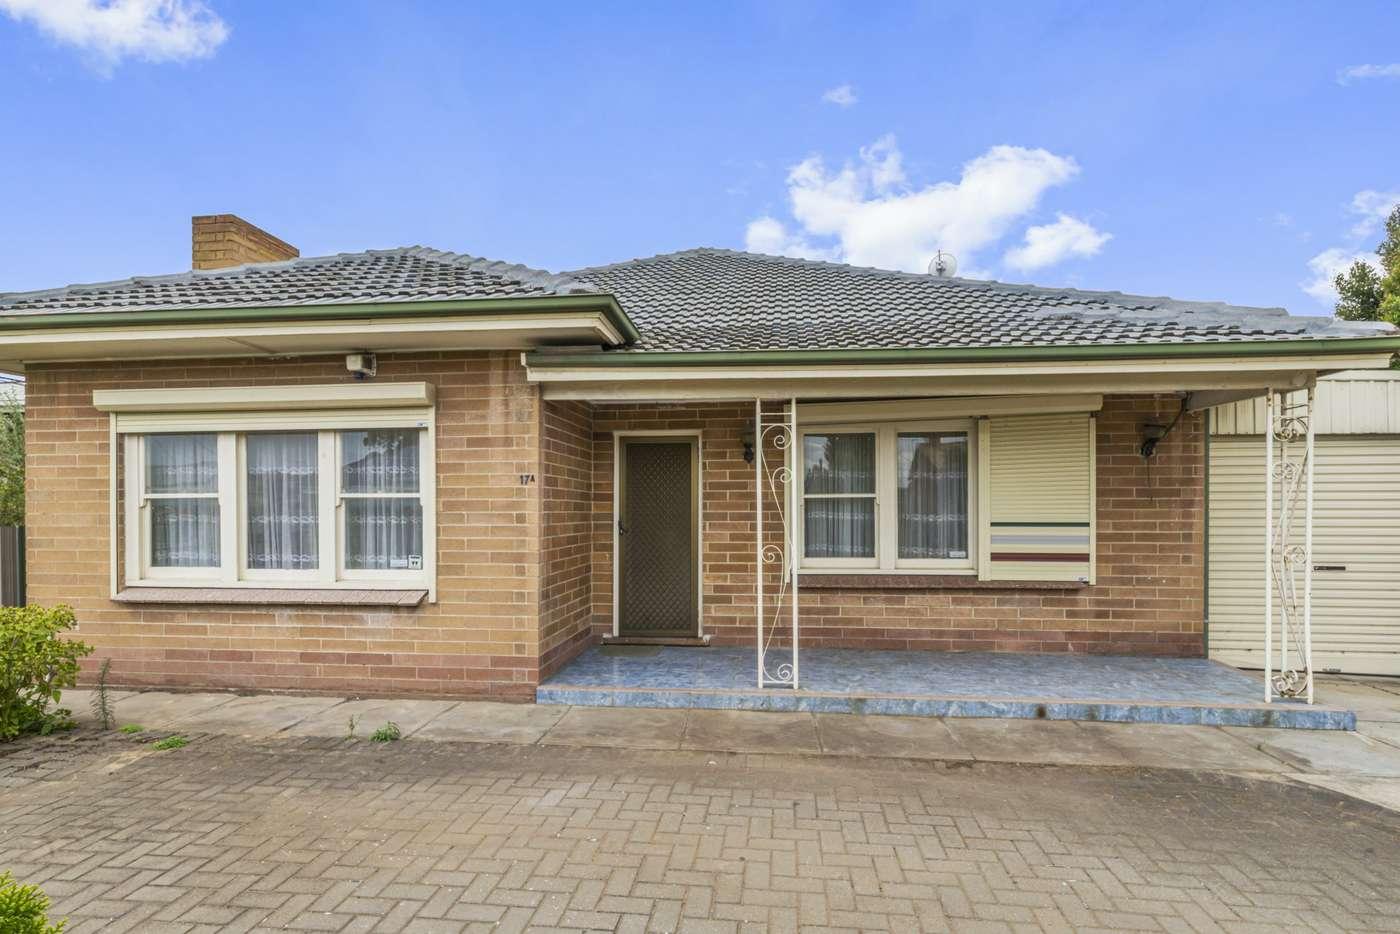 Main view of Homely house listing, 17A Lavinia Street, Athol Park SA 5012